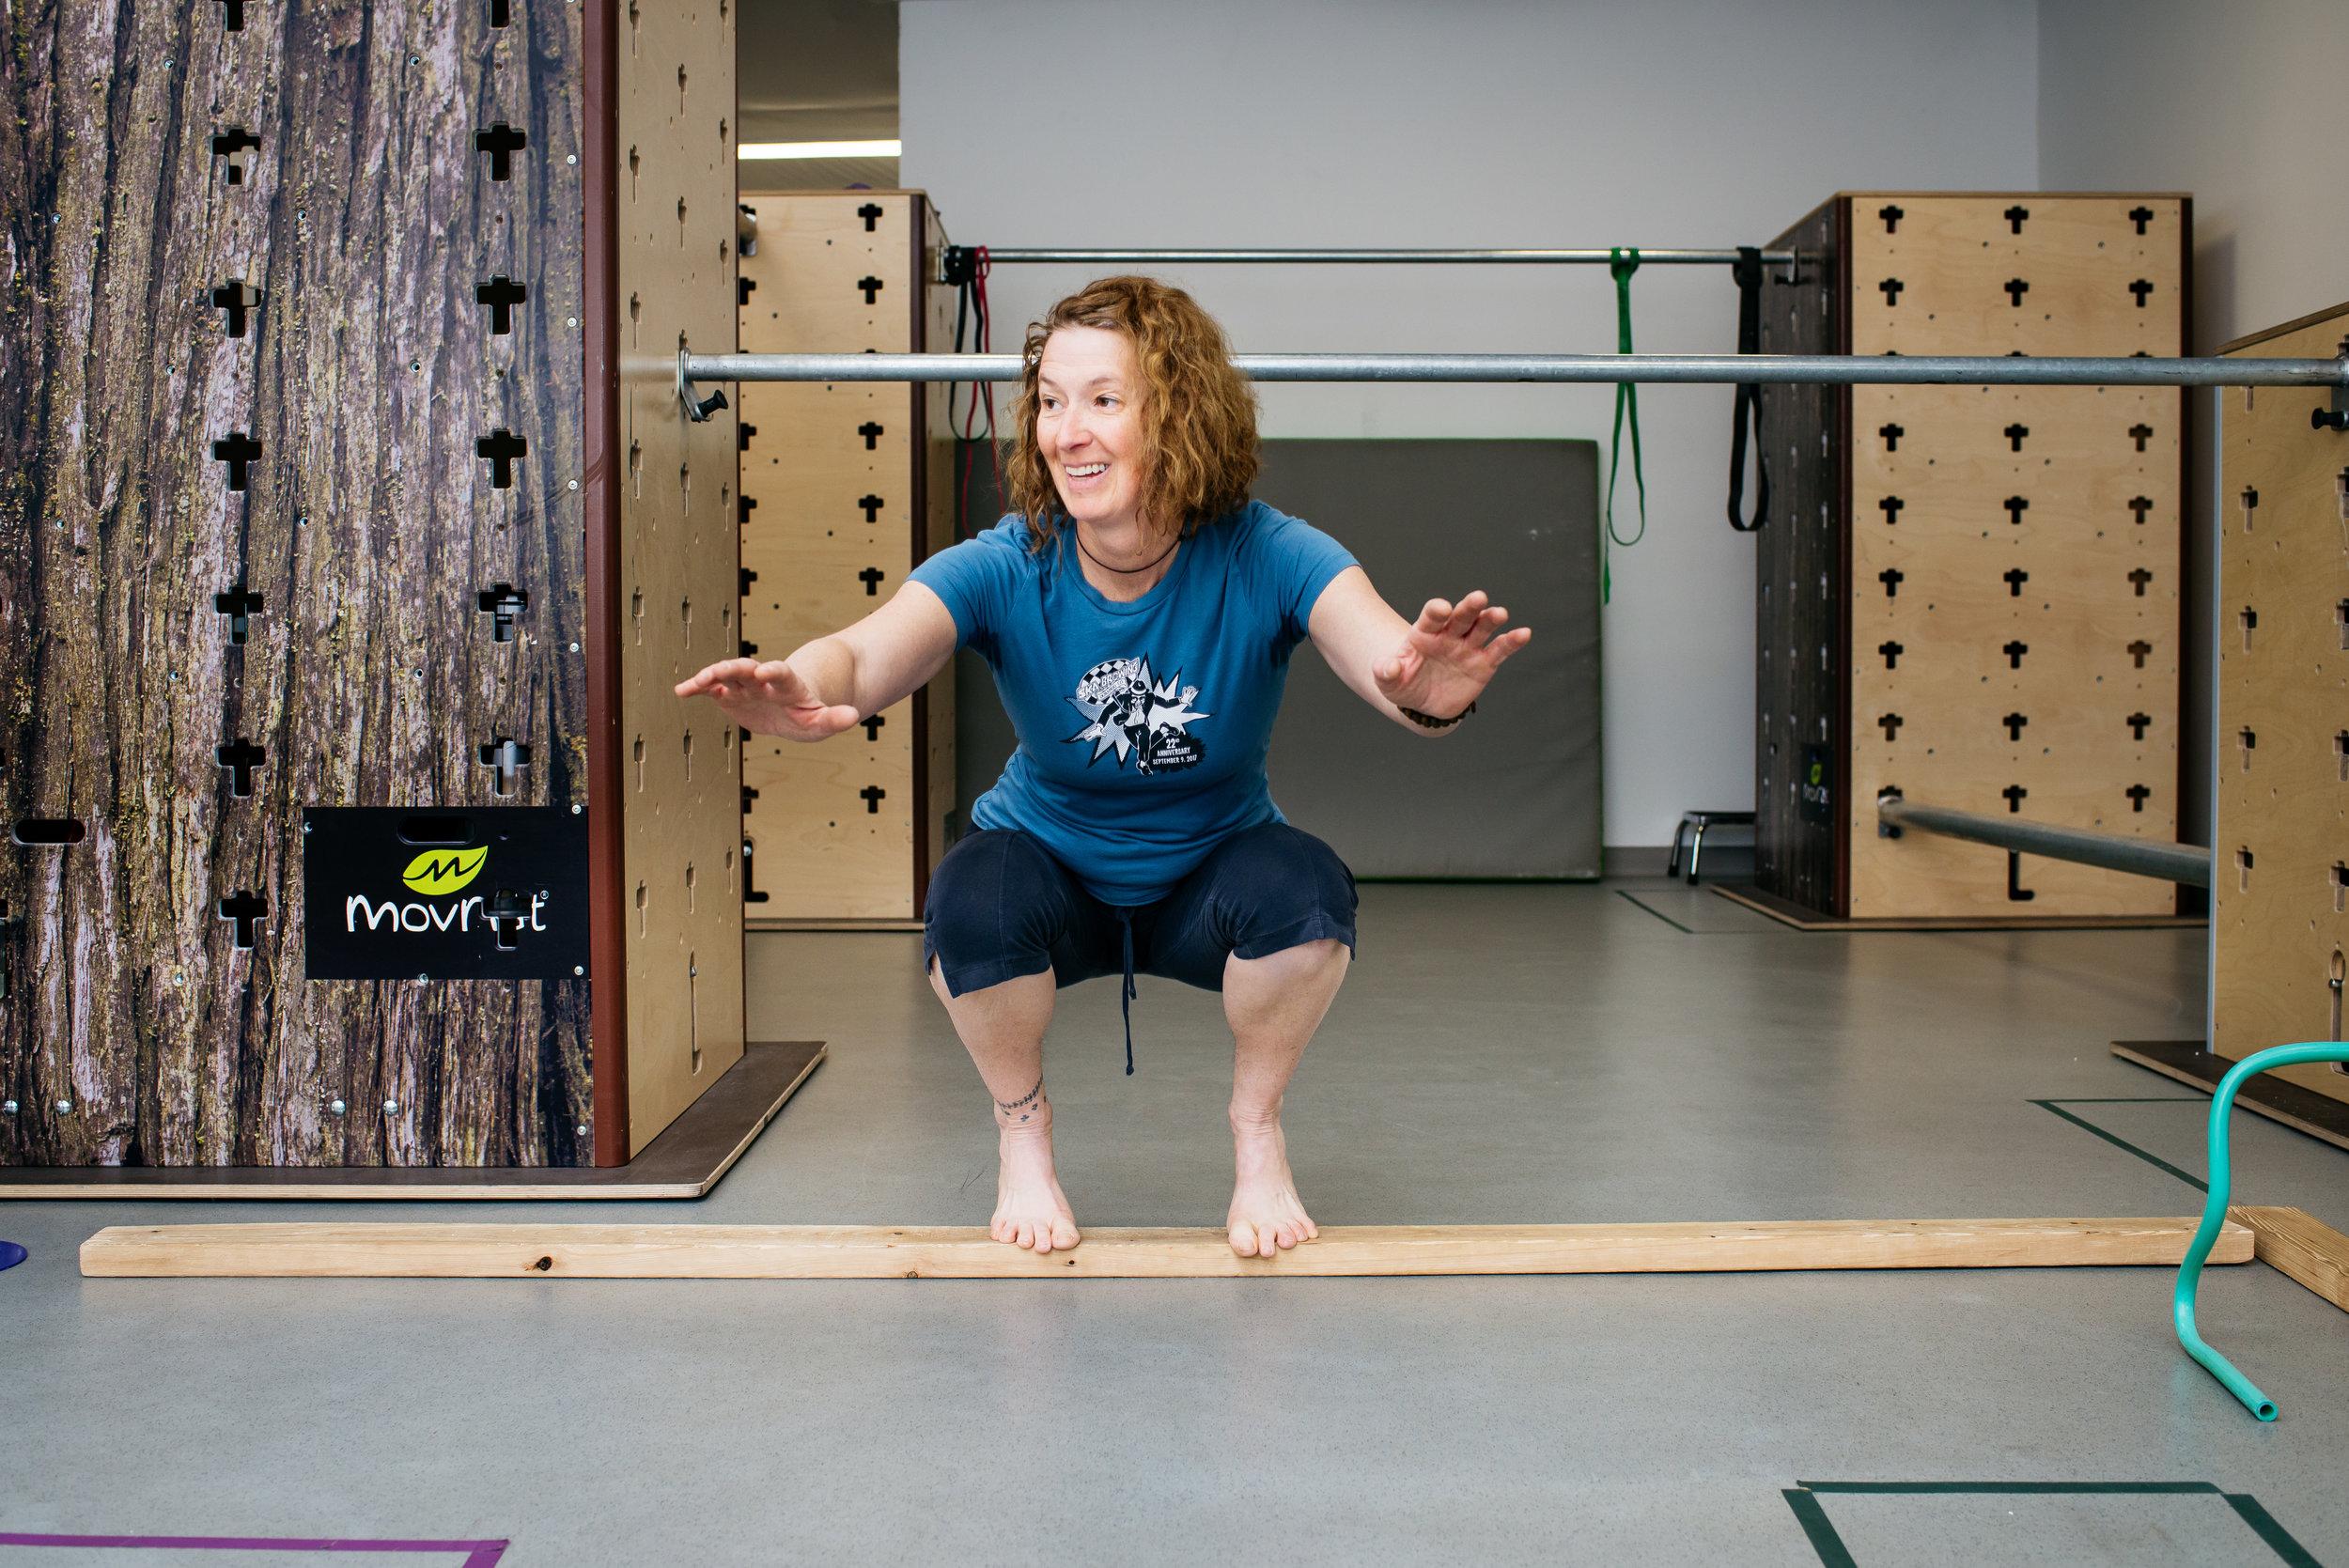 Bonnie deep squat balance MovNat MoveTru Albuquerque